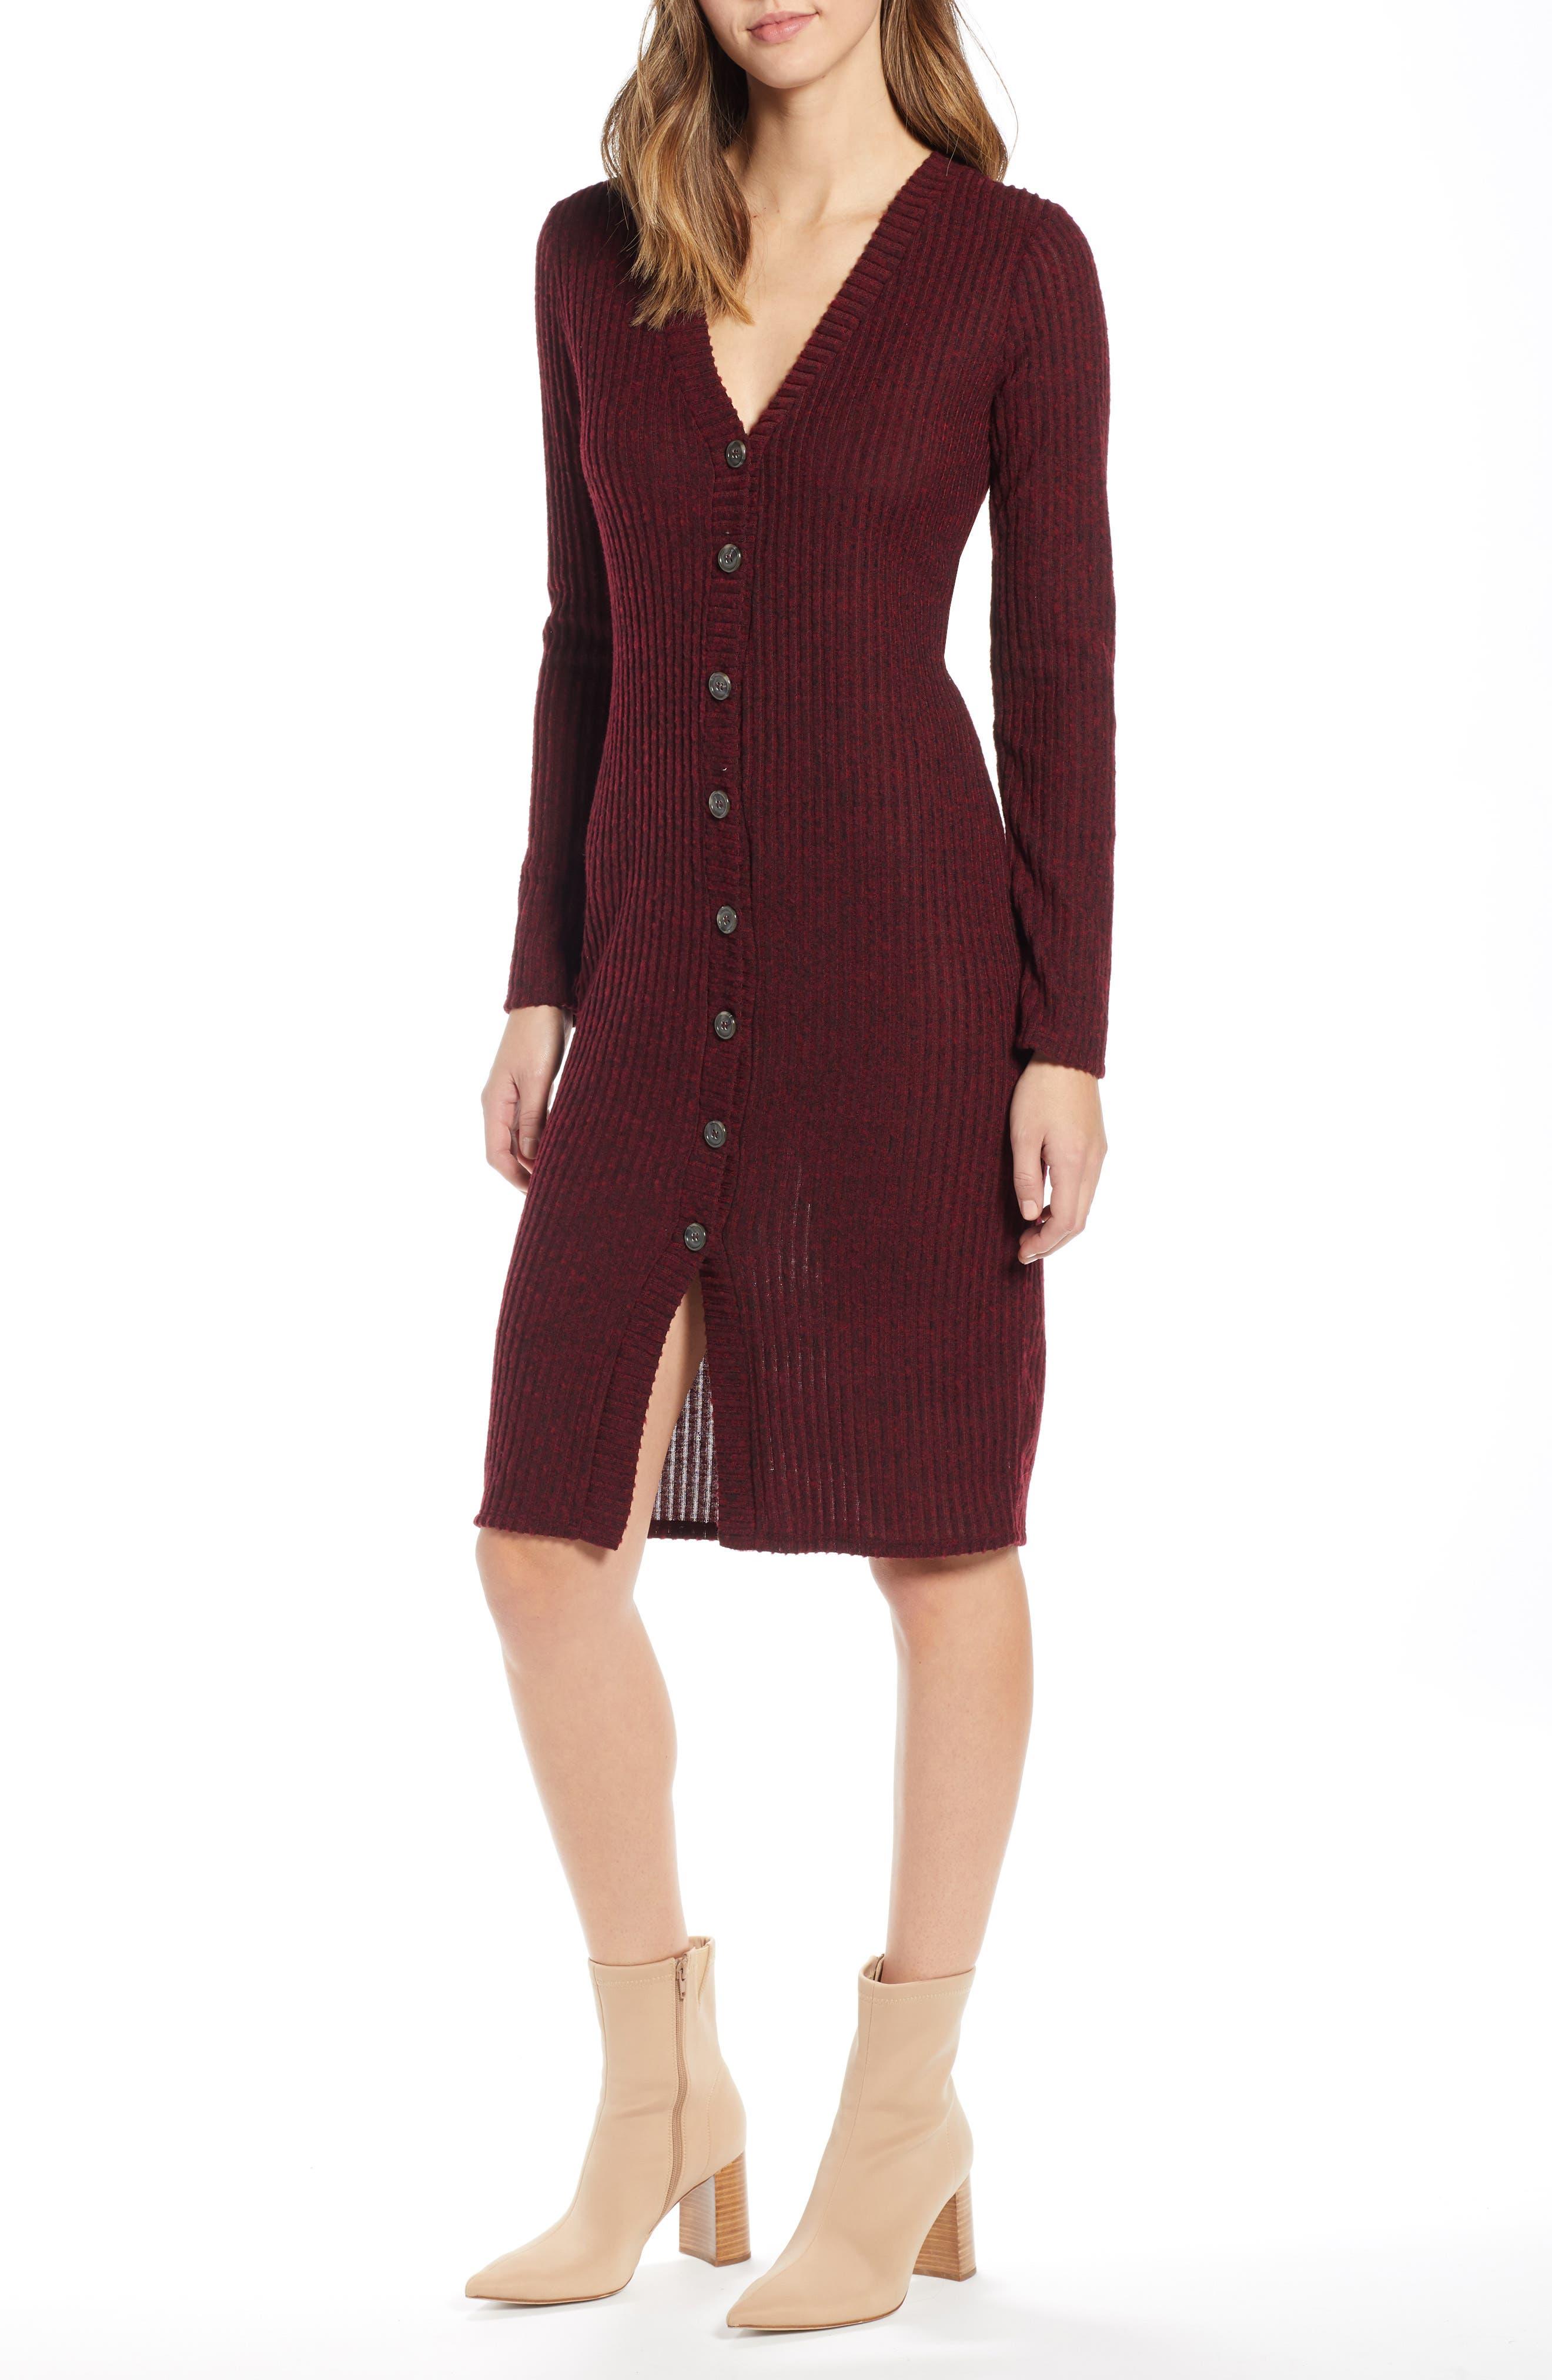 Socialite Sweater Dress